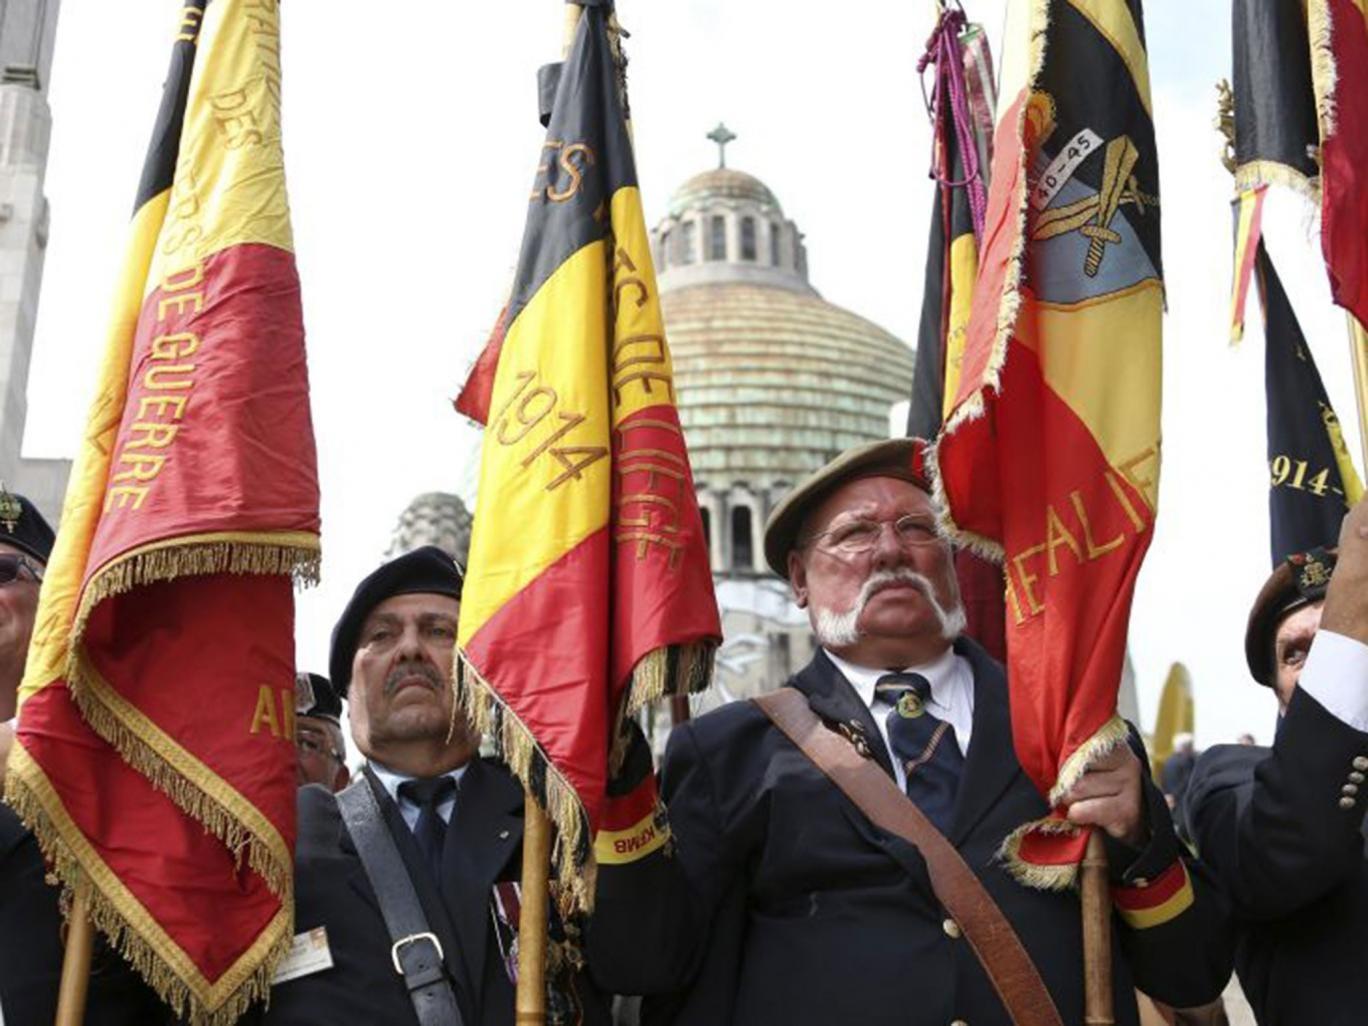 Veterans at the Allies memorial in Cointe, Belgium